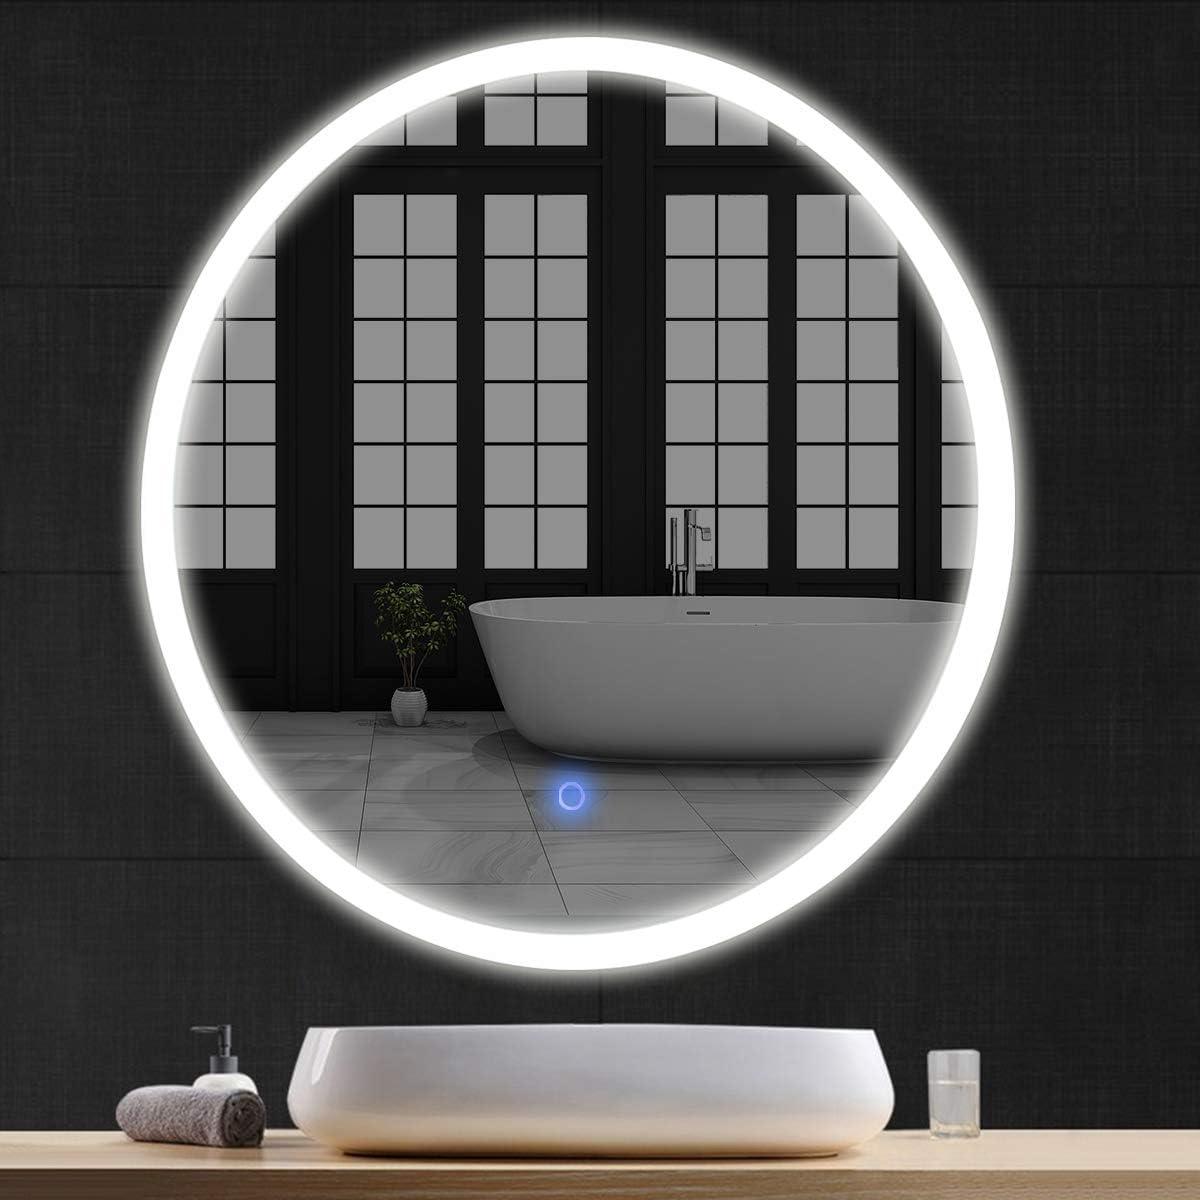 Tangkula Makeup Vanity Mirror With Lights Reviews